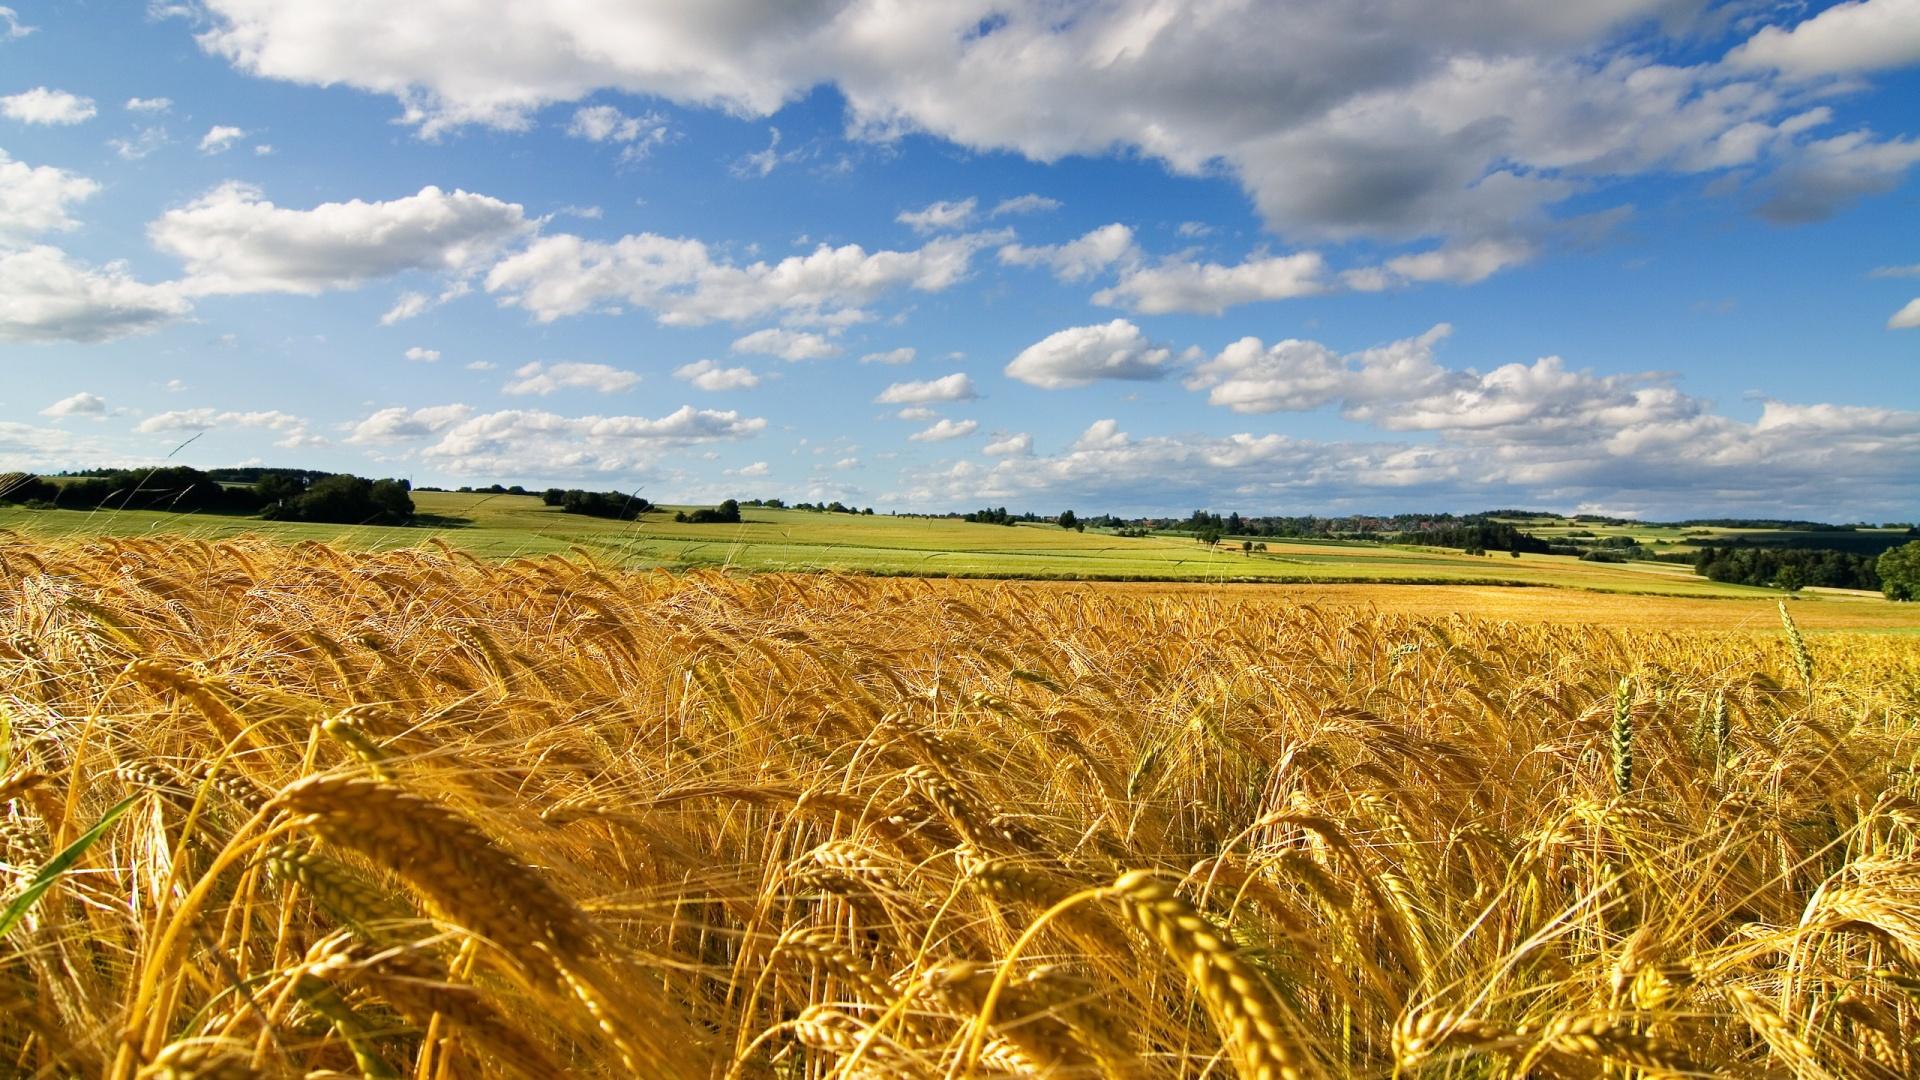 cornfield-summer-1920x1080.jpg